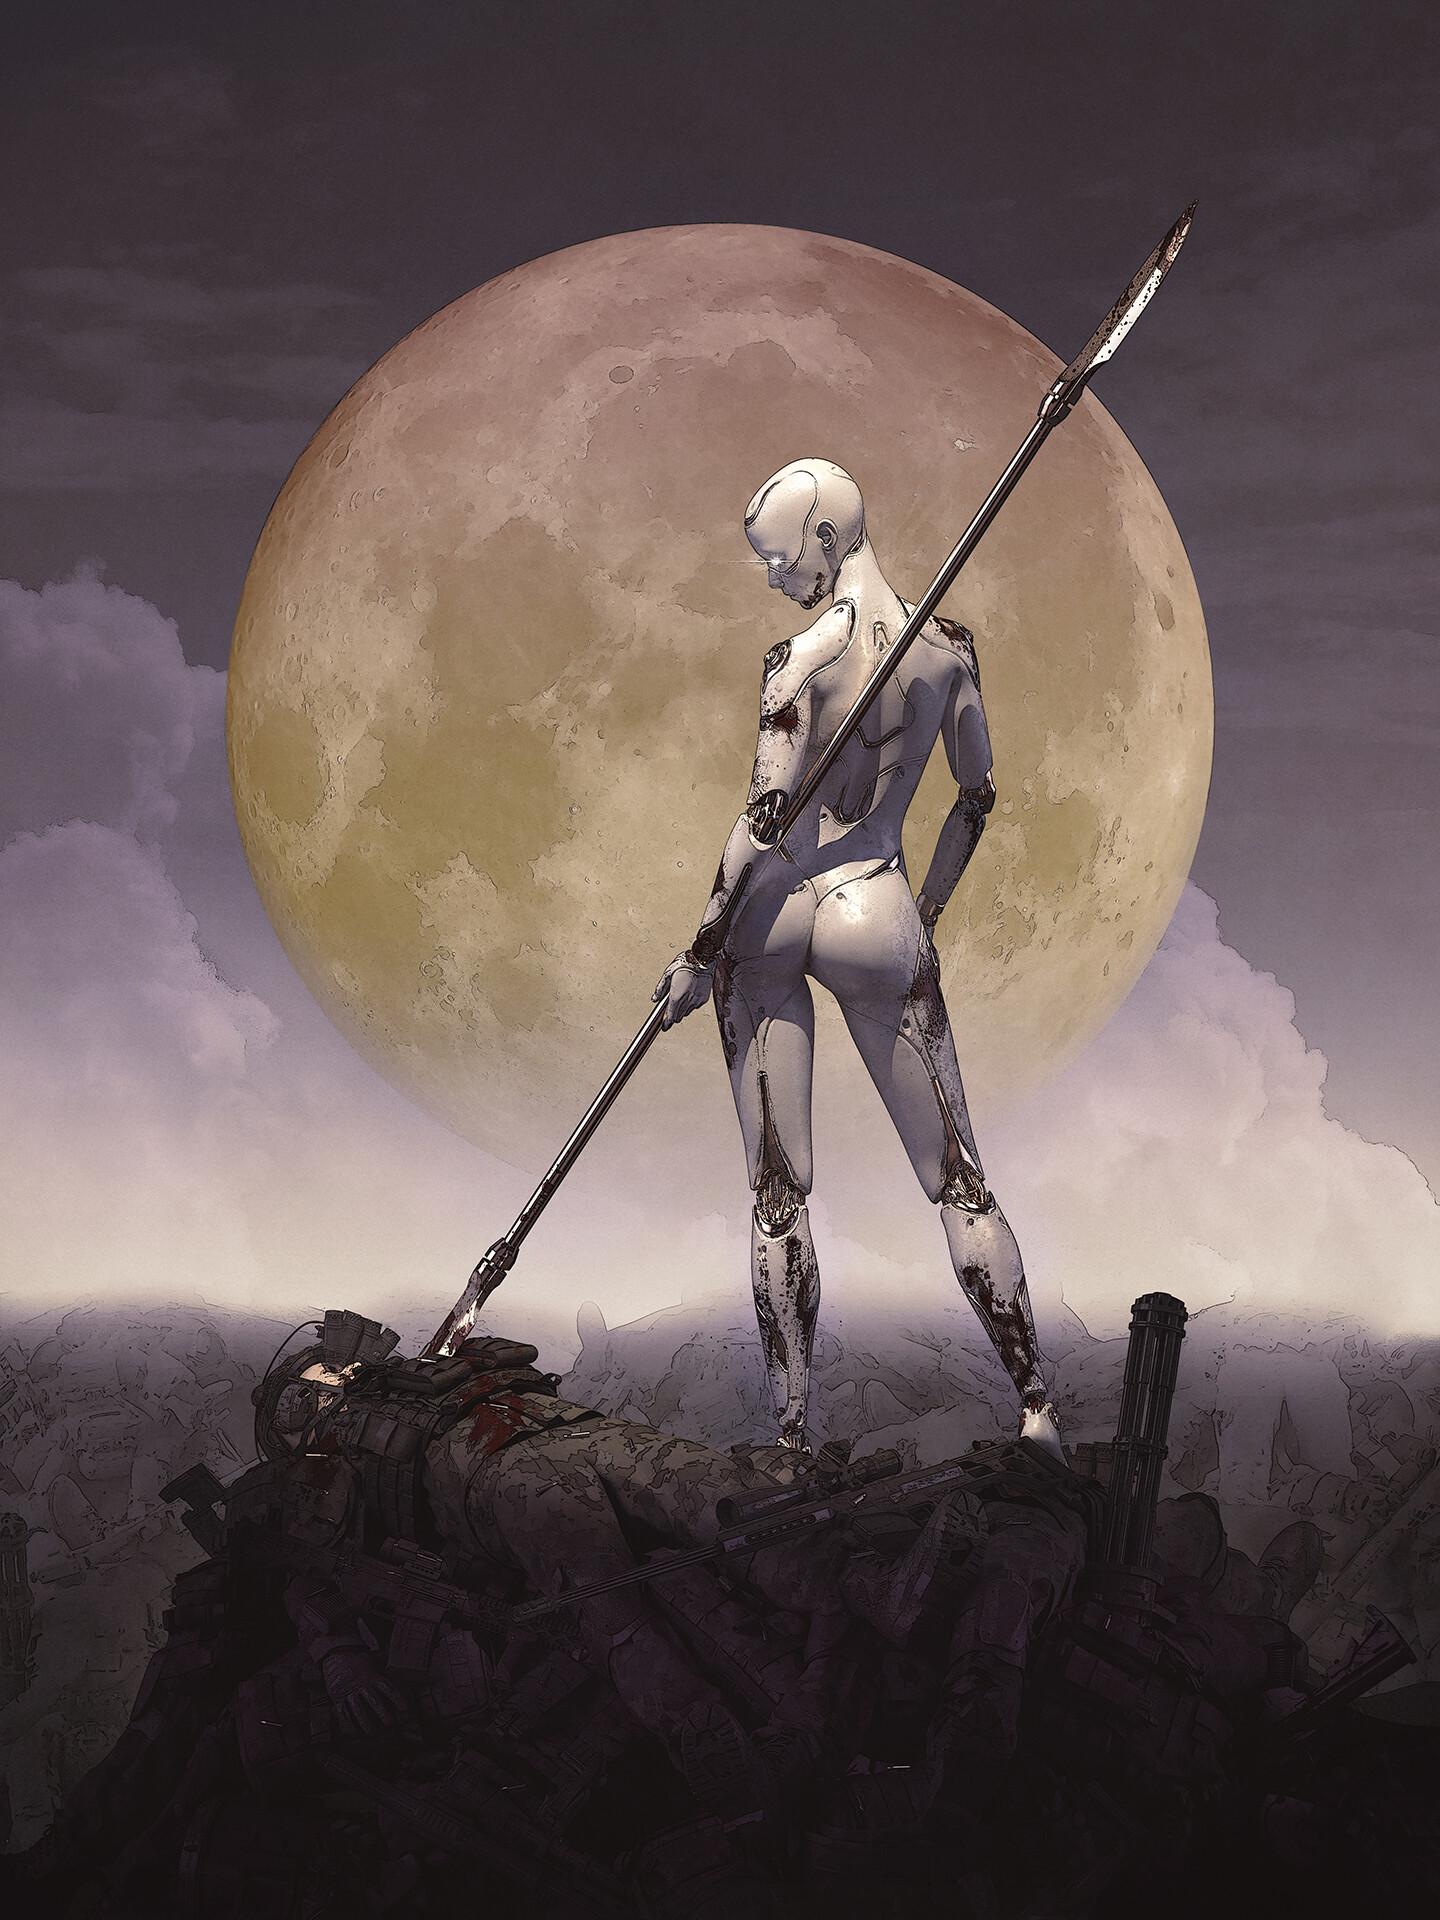 General 1440x1920 artwork standing ass ArtStation blood corpse weapon machine robot Moon spear cyborg